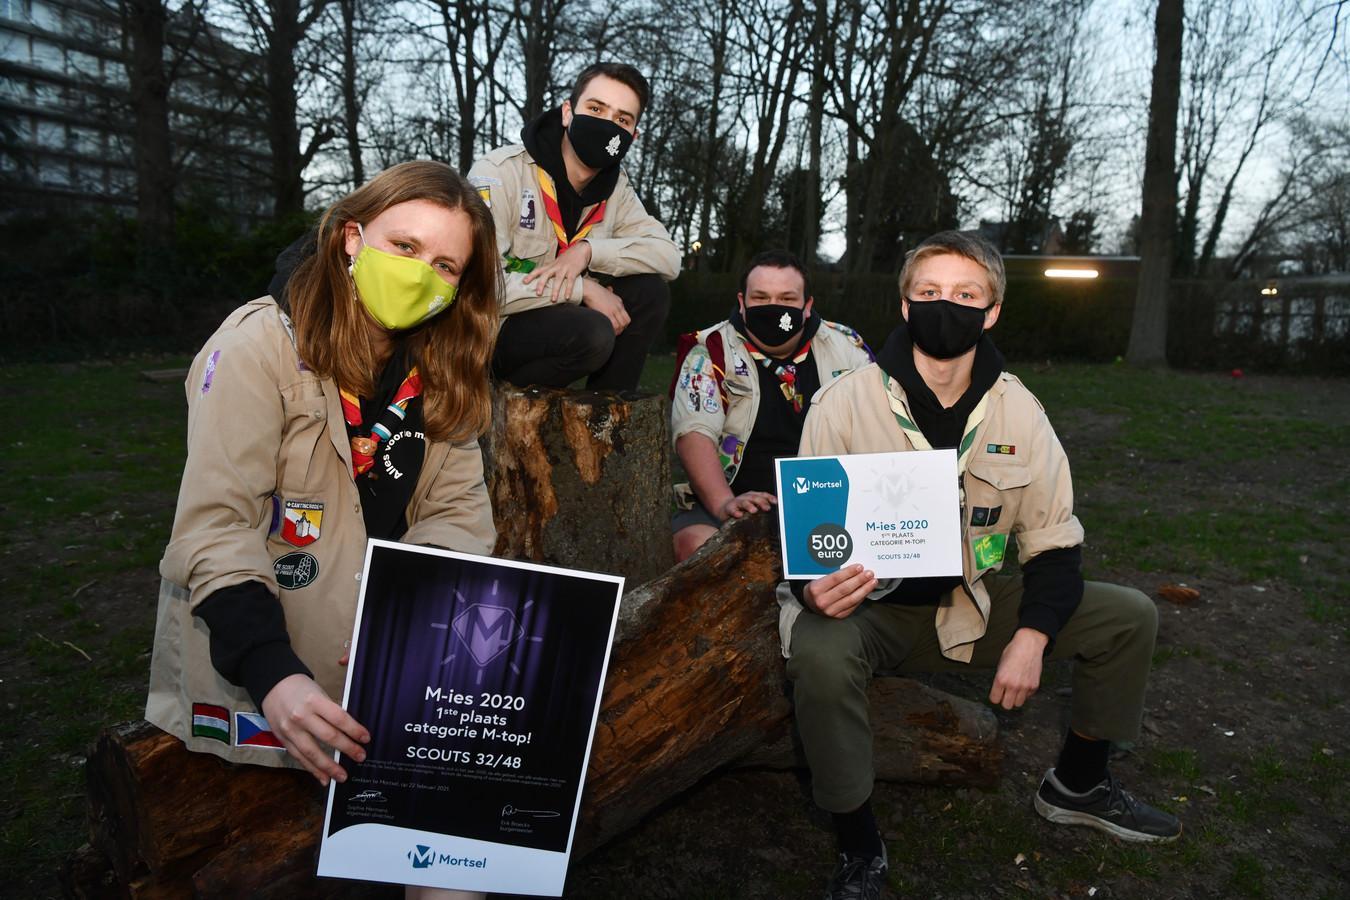 Scouts 32/48 wint de M-Top award.